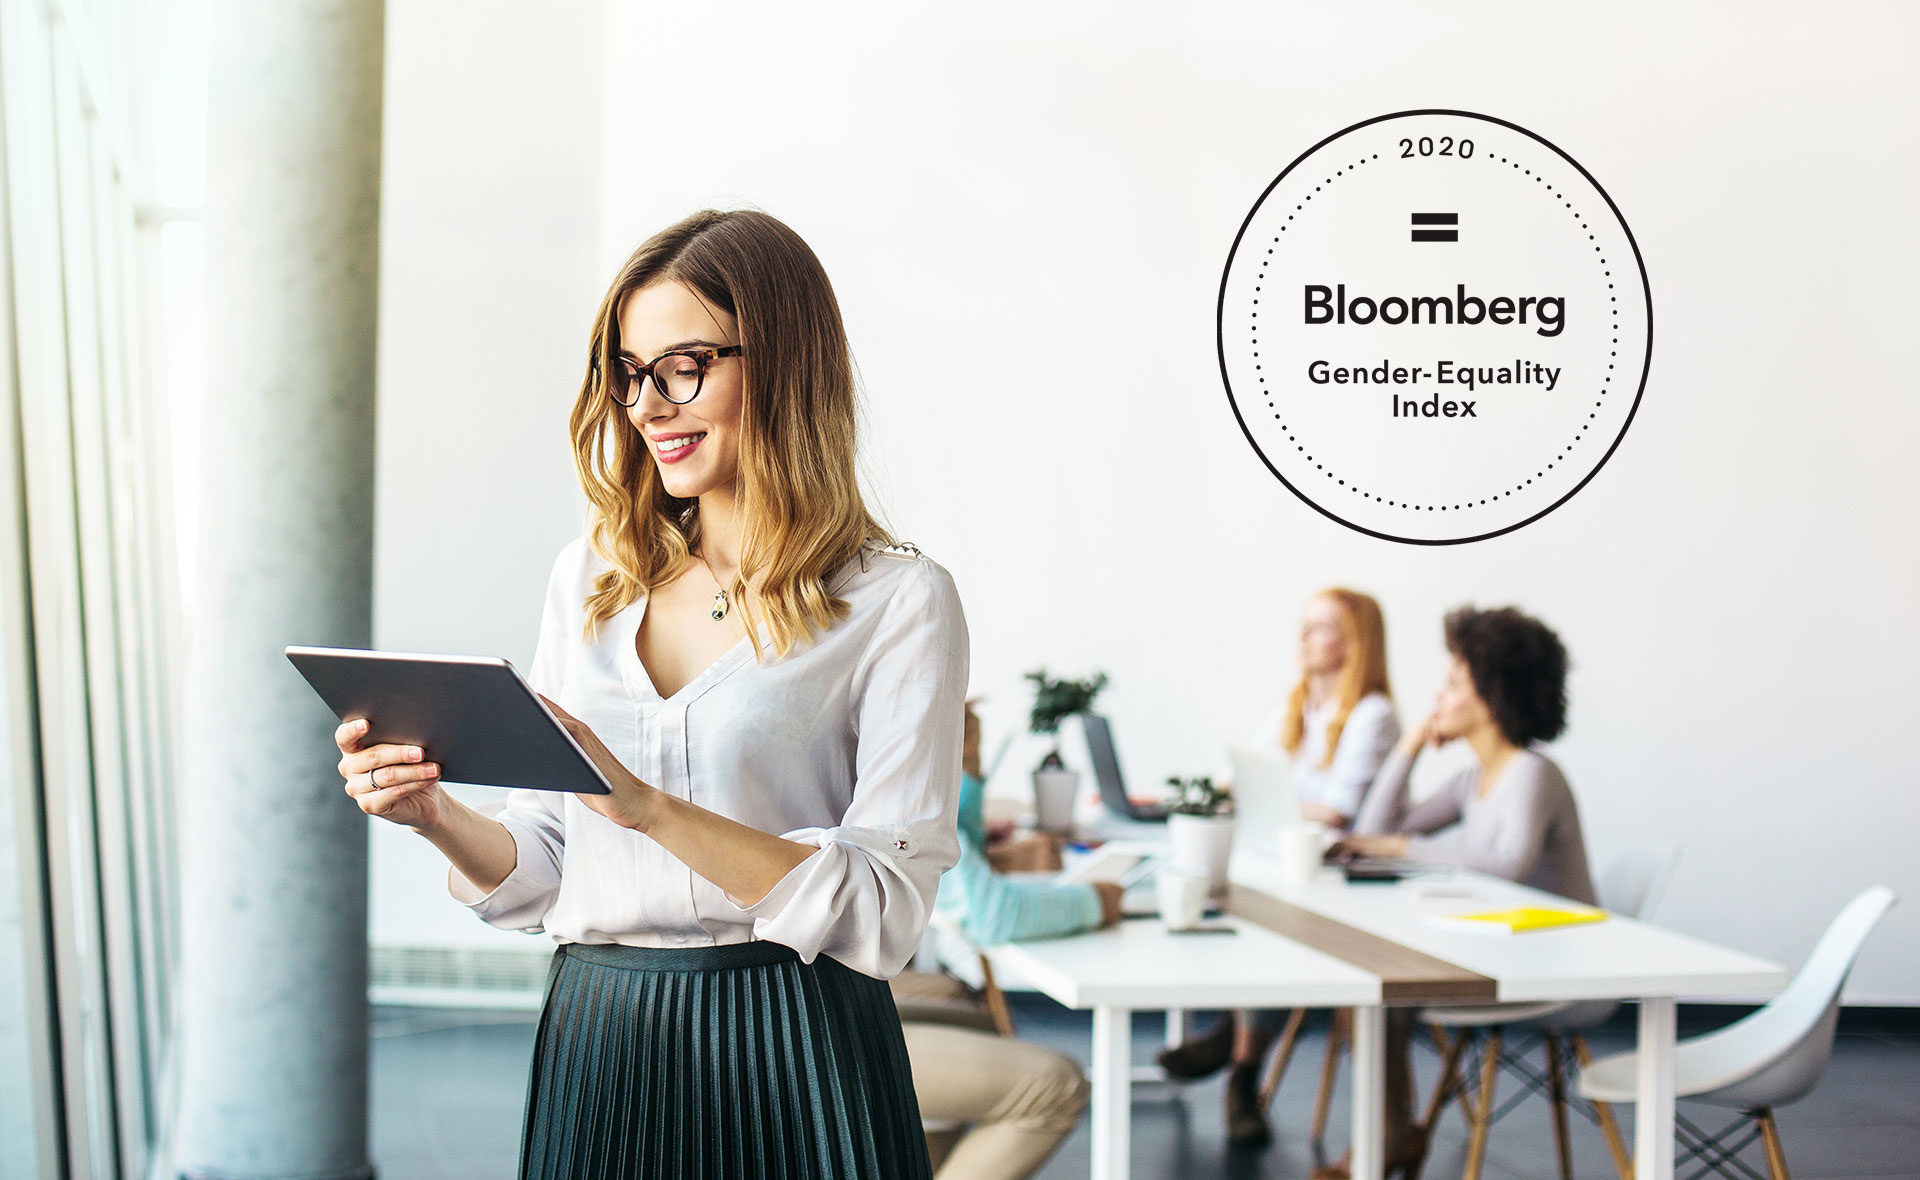 bloomberg-indice-bloomberg-igualdad-woman-mujer-equidad-